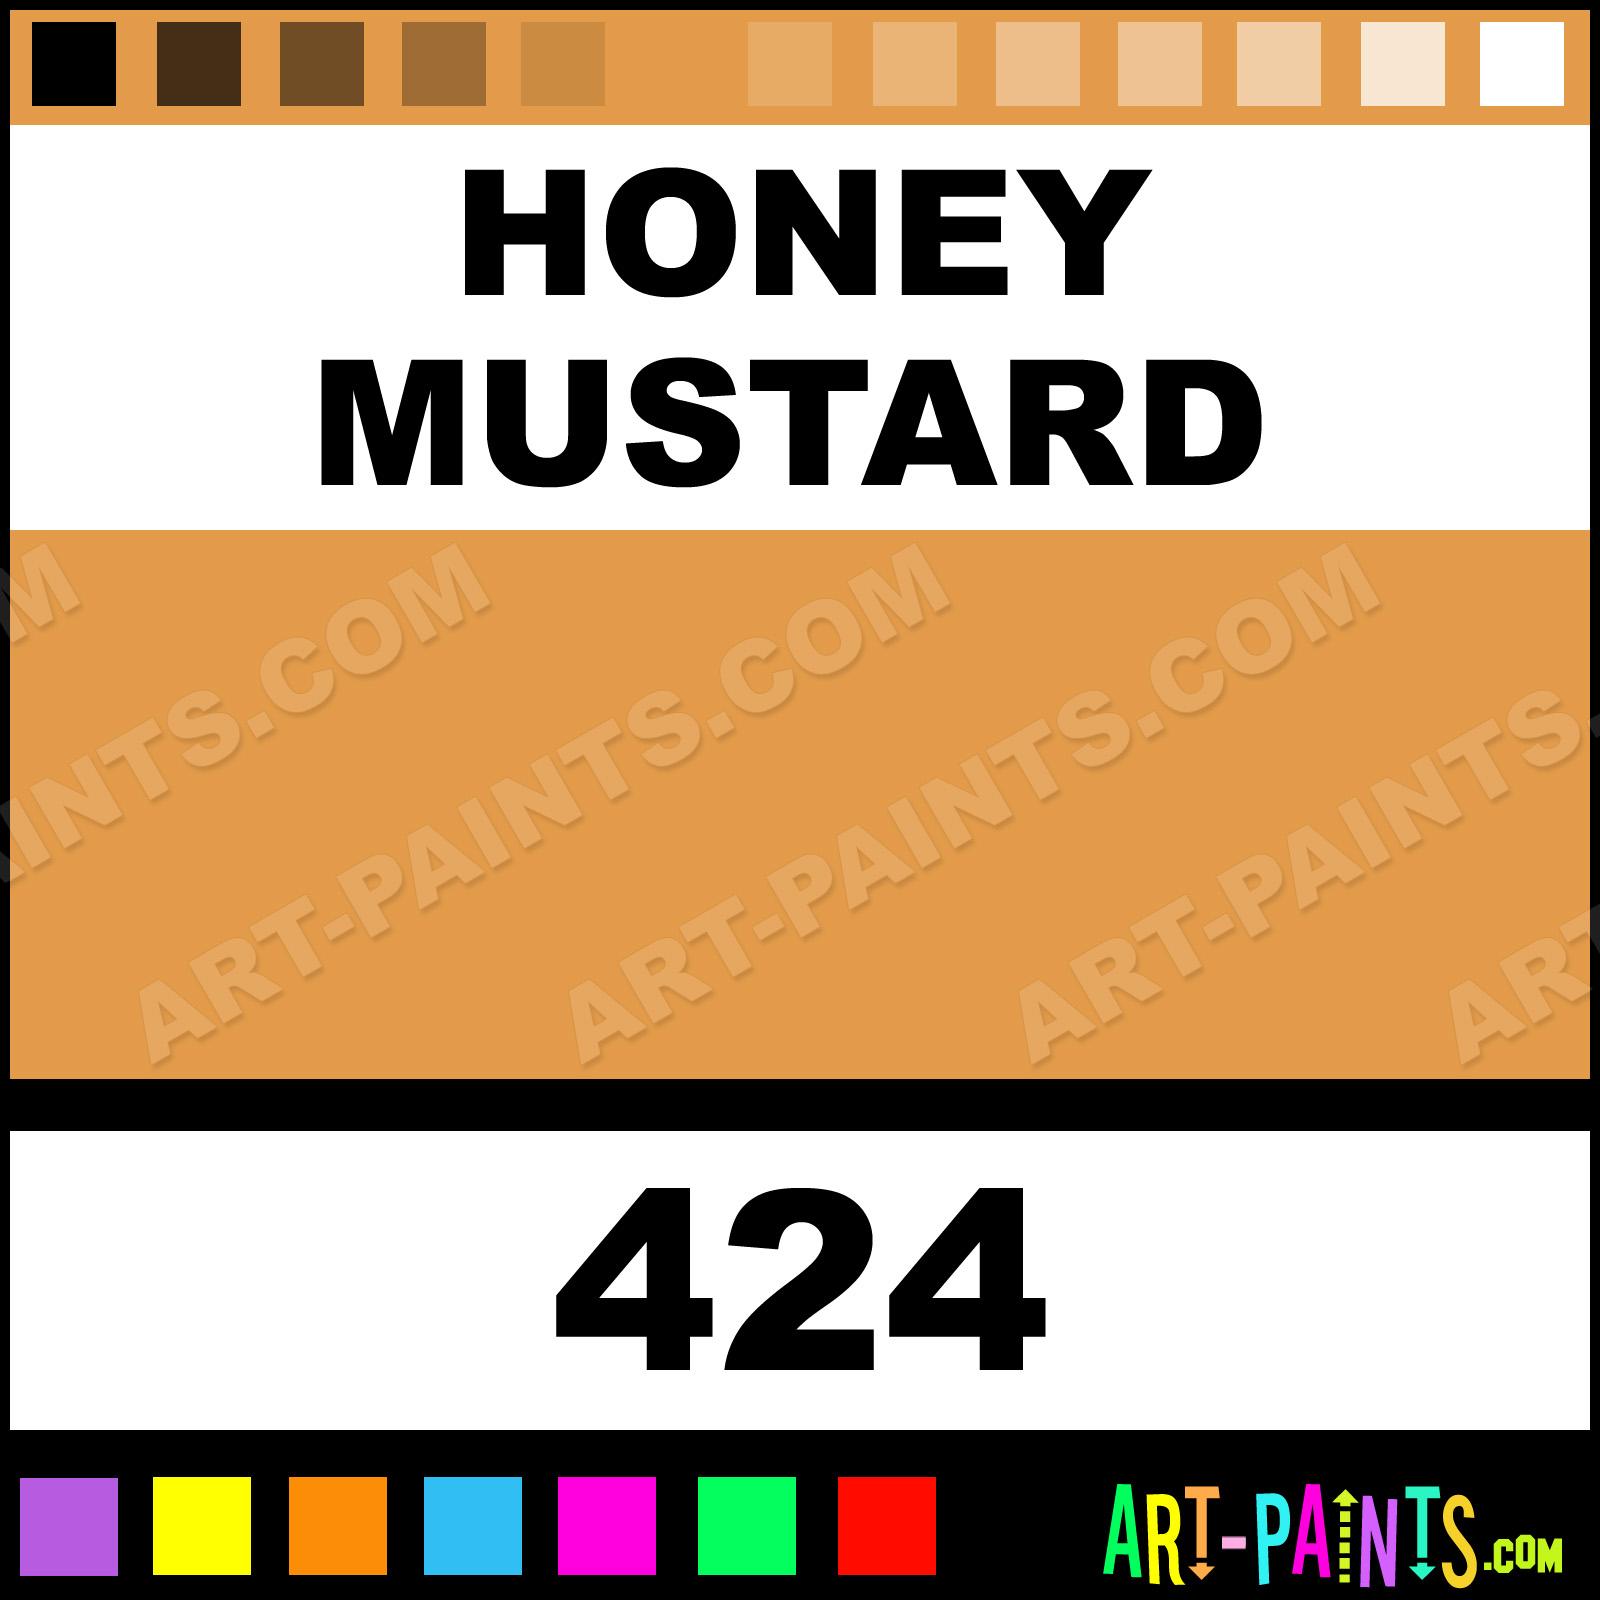 honey mustard superwriters ceramic paints - 424 - honey mustard